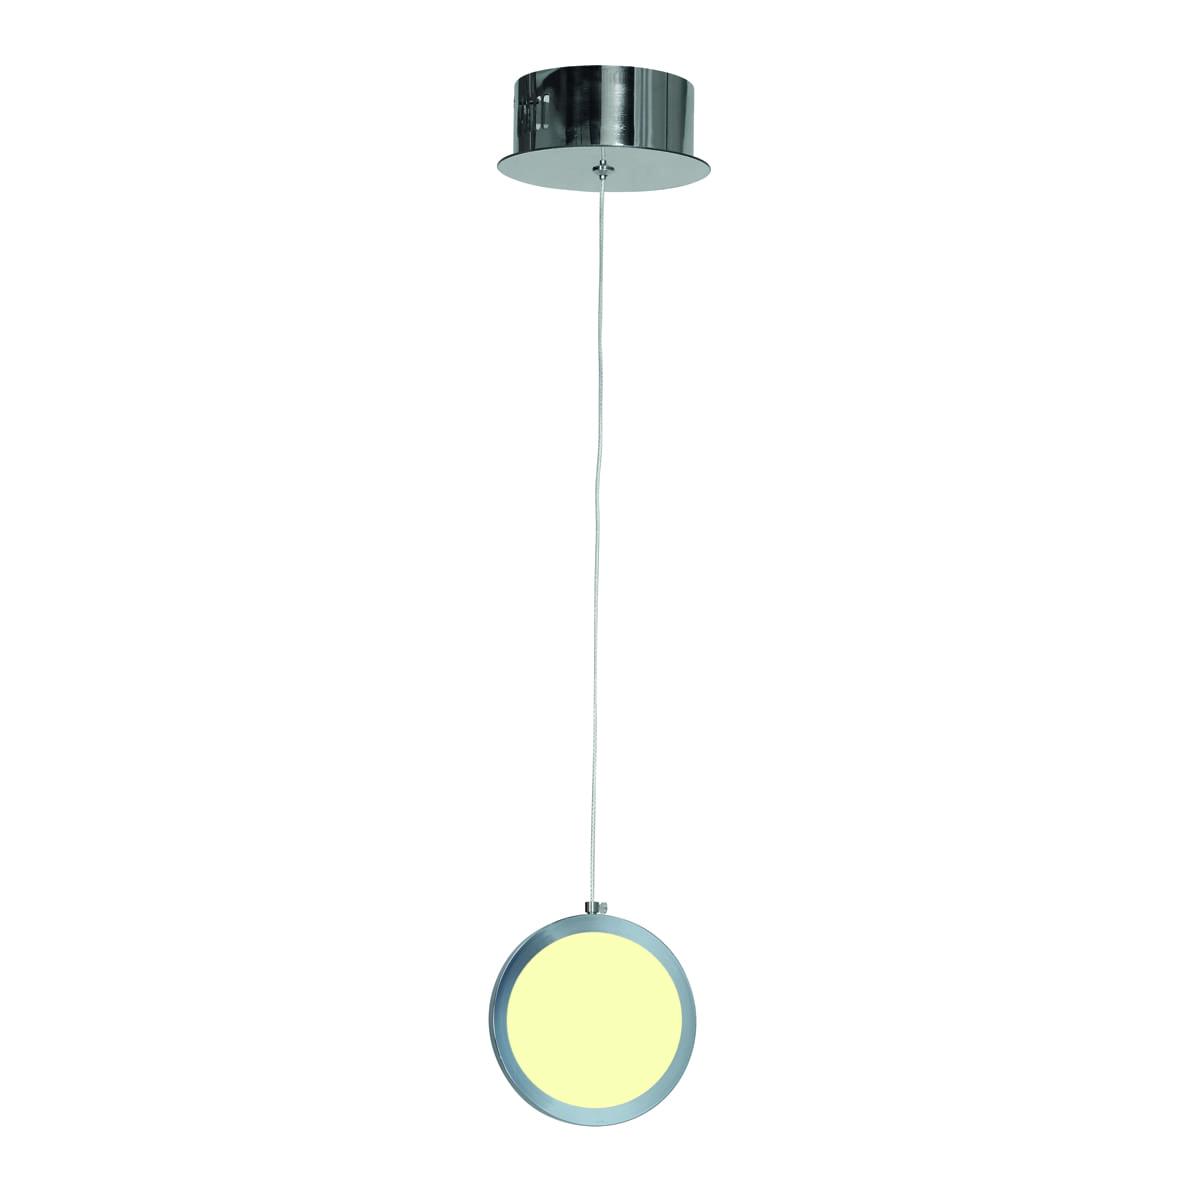 Lampa wisząca Milagro CIRCOLO 264 Chrom 7W